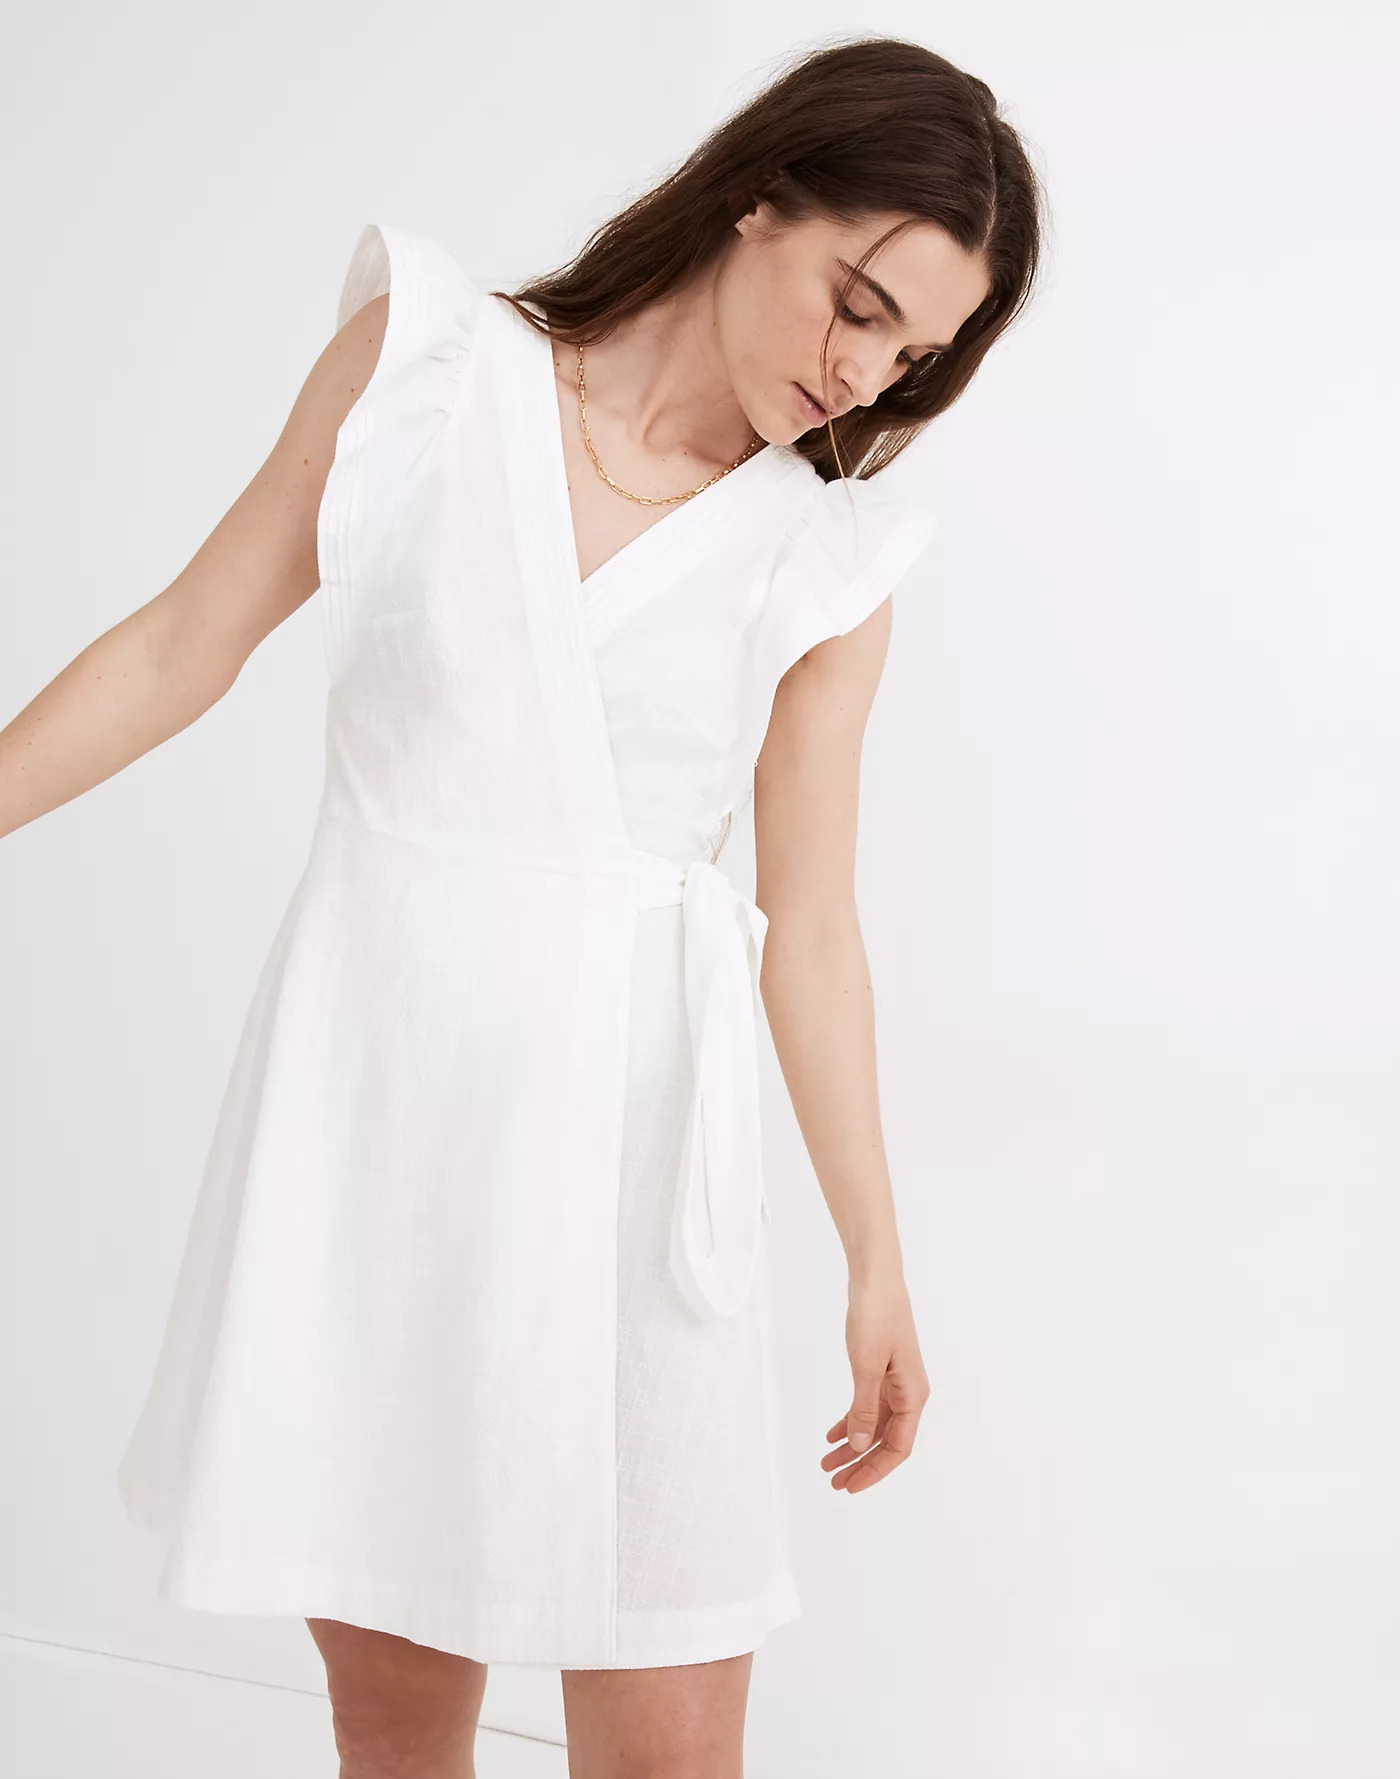 best dresses for bridal showers